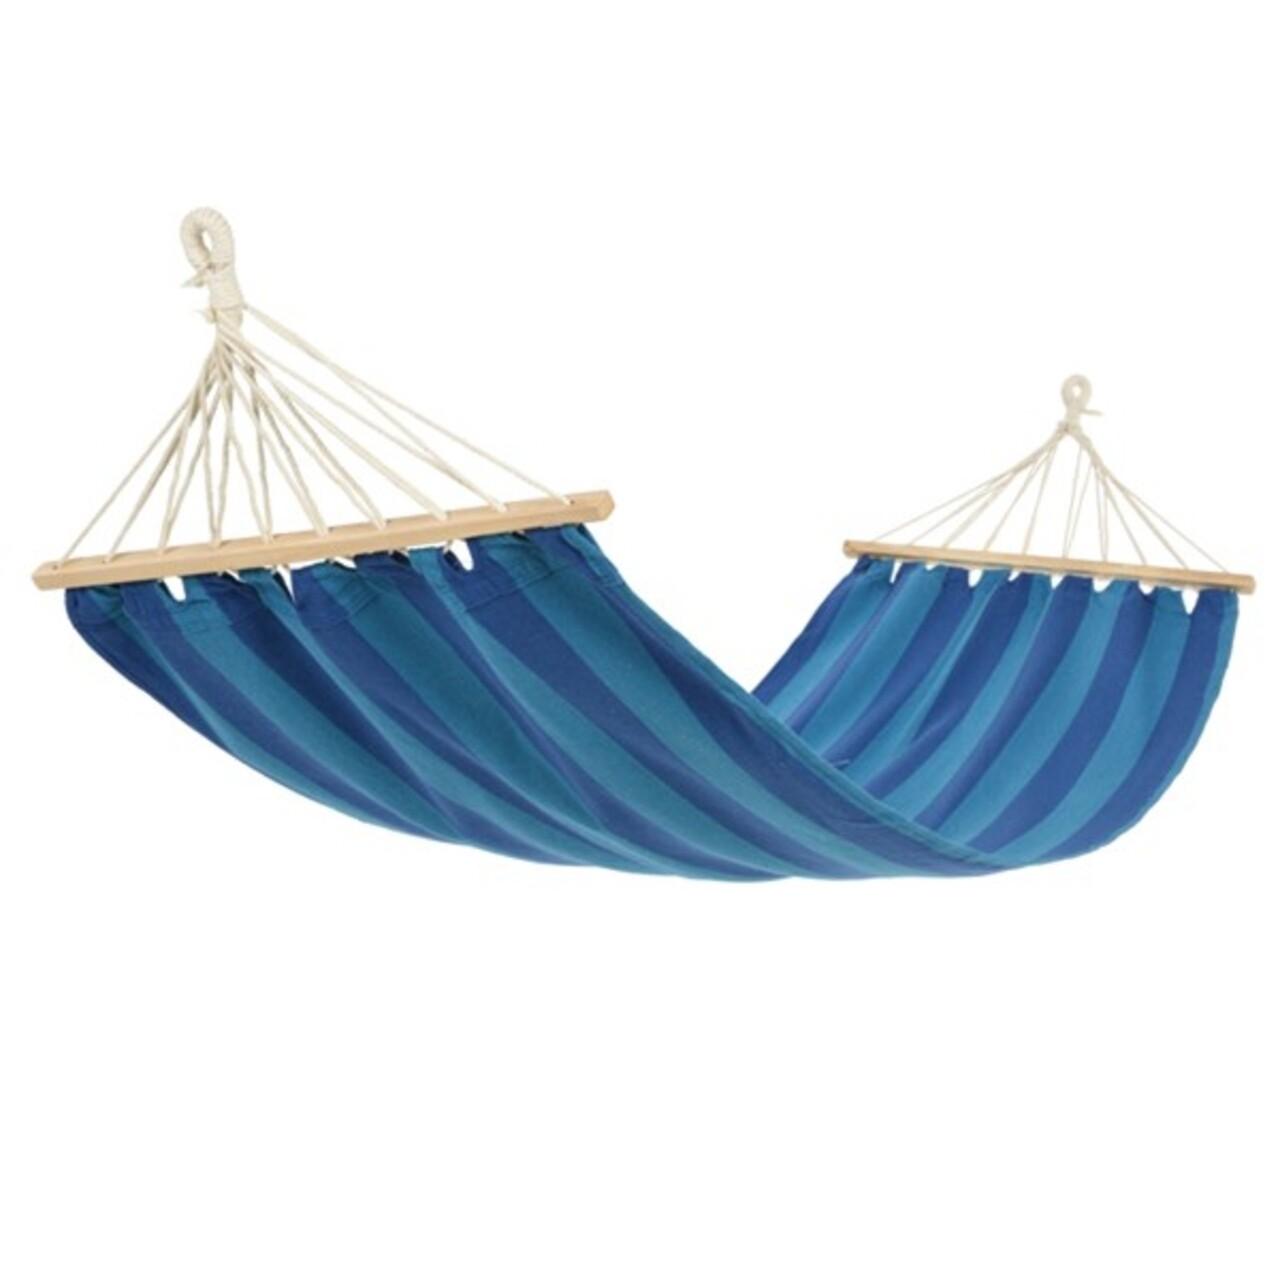 Hamac Stripes Blue, Decoris, 200x80 cm, albastru